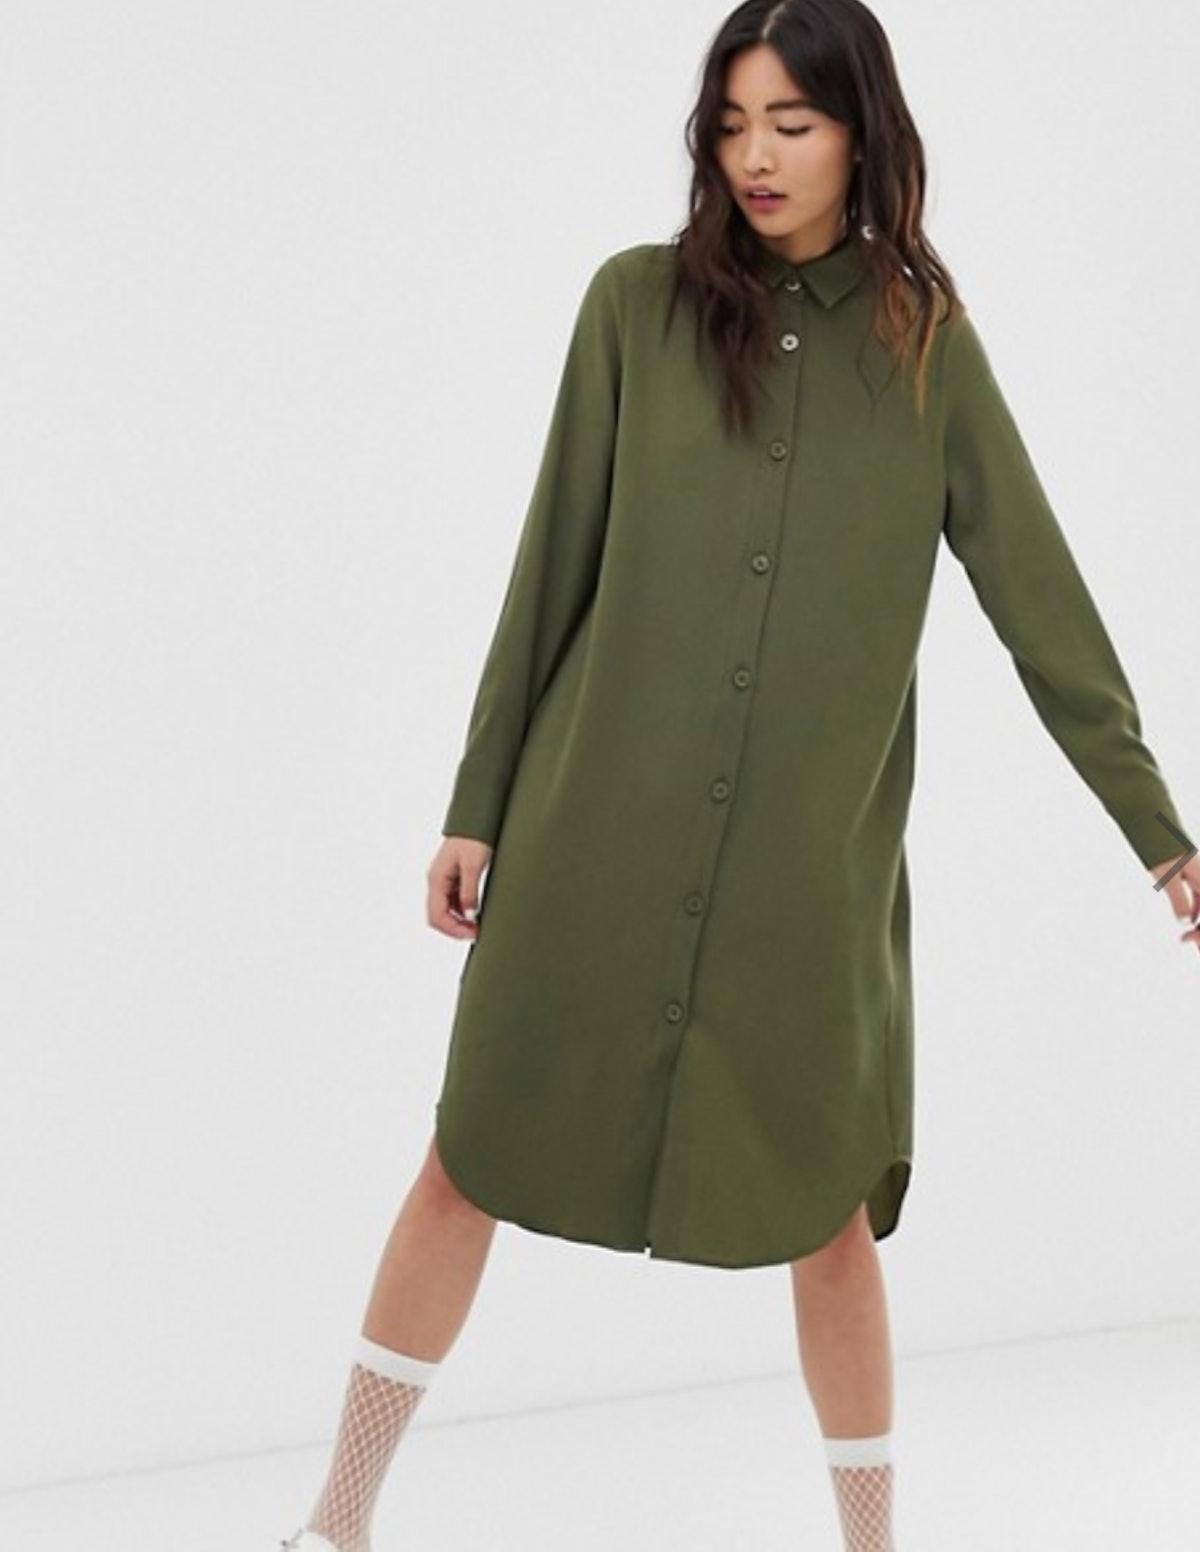 Monki Midi Shirt Dress in Khaki